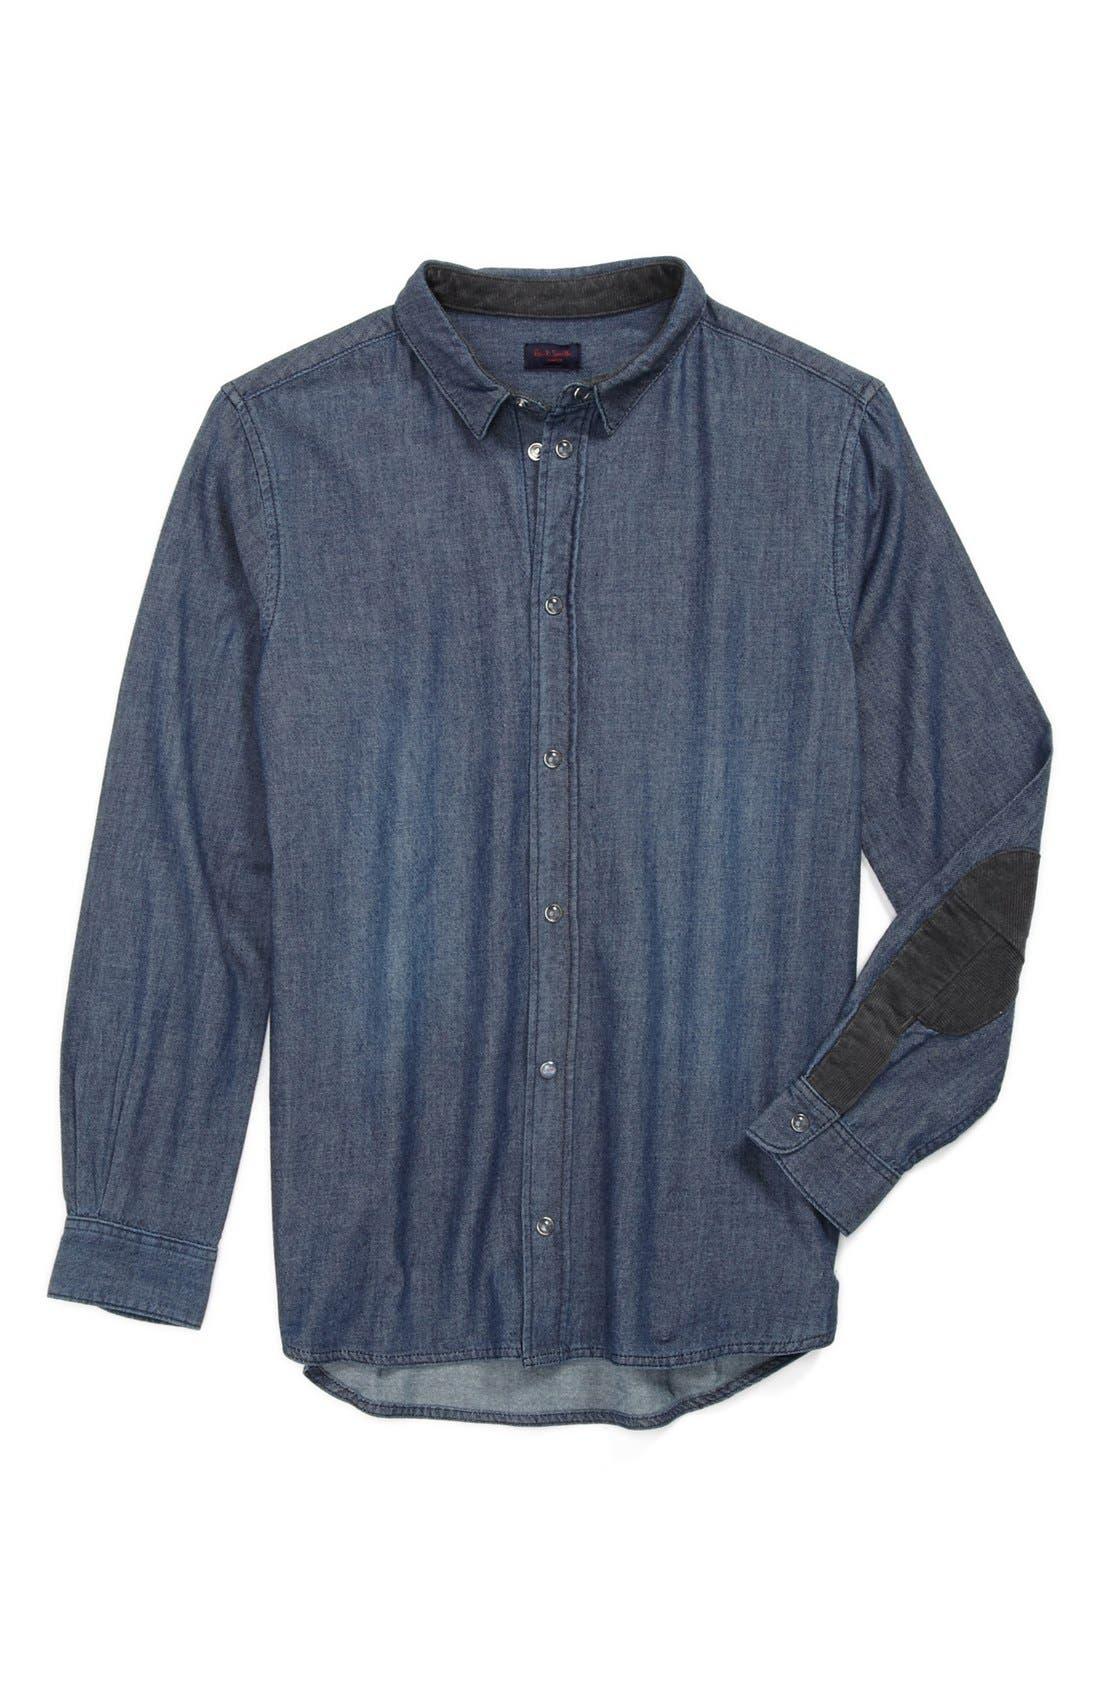 Alternate Image 1 Selected - Paul Smith Junior 'Enock' Denim Shirt (Toddler Boys)